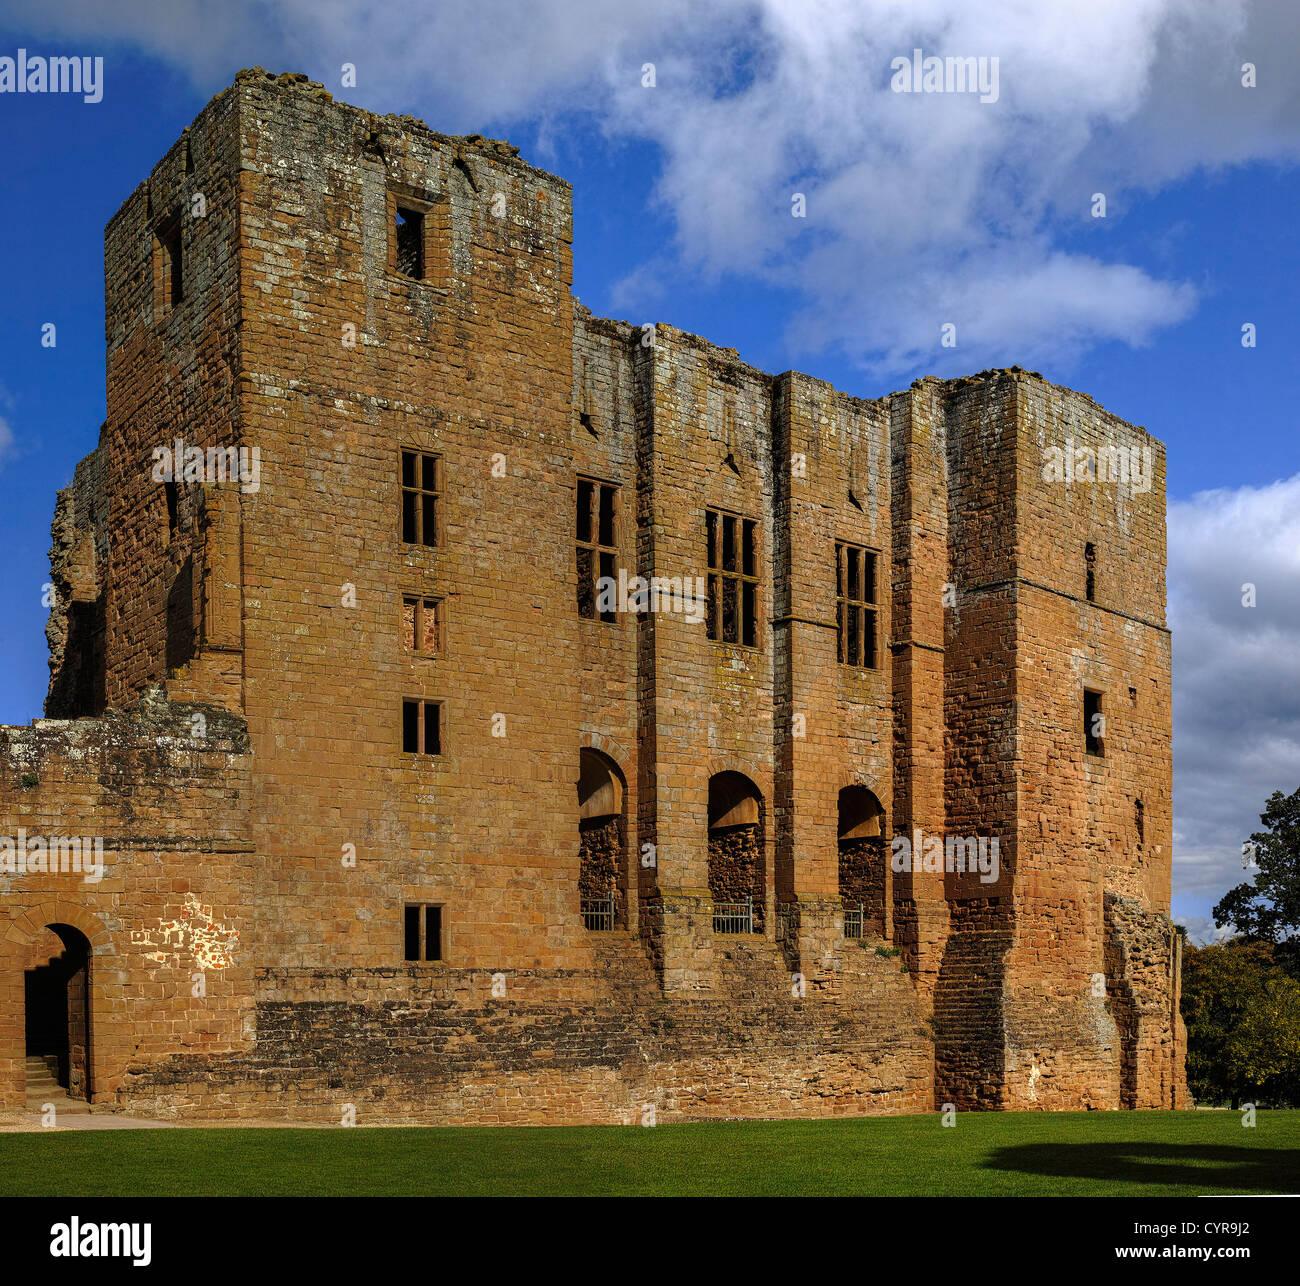 kenilworth castle warwickshire england uk - Stock Image